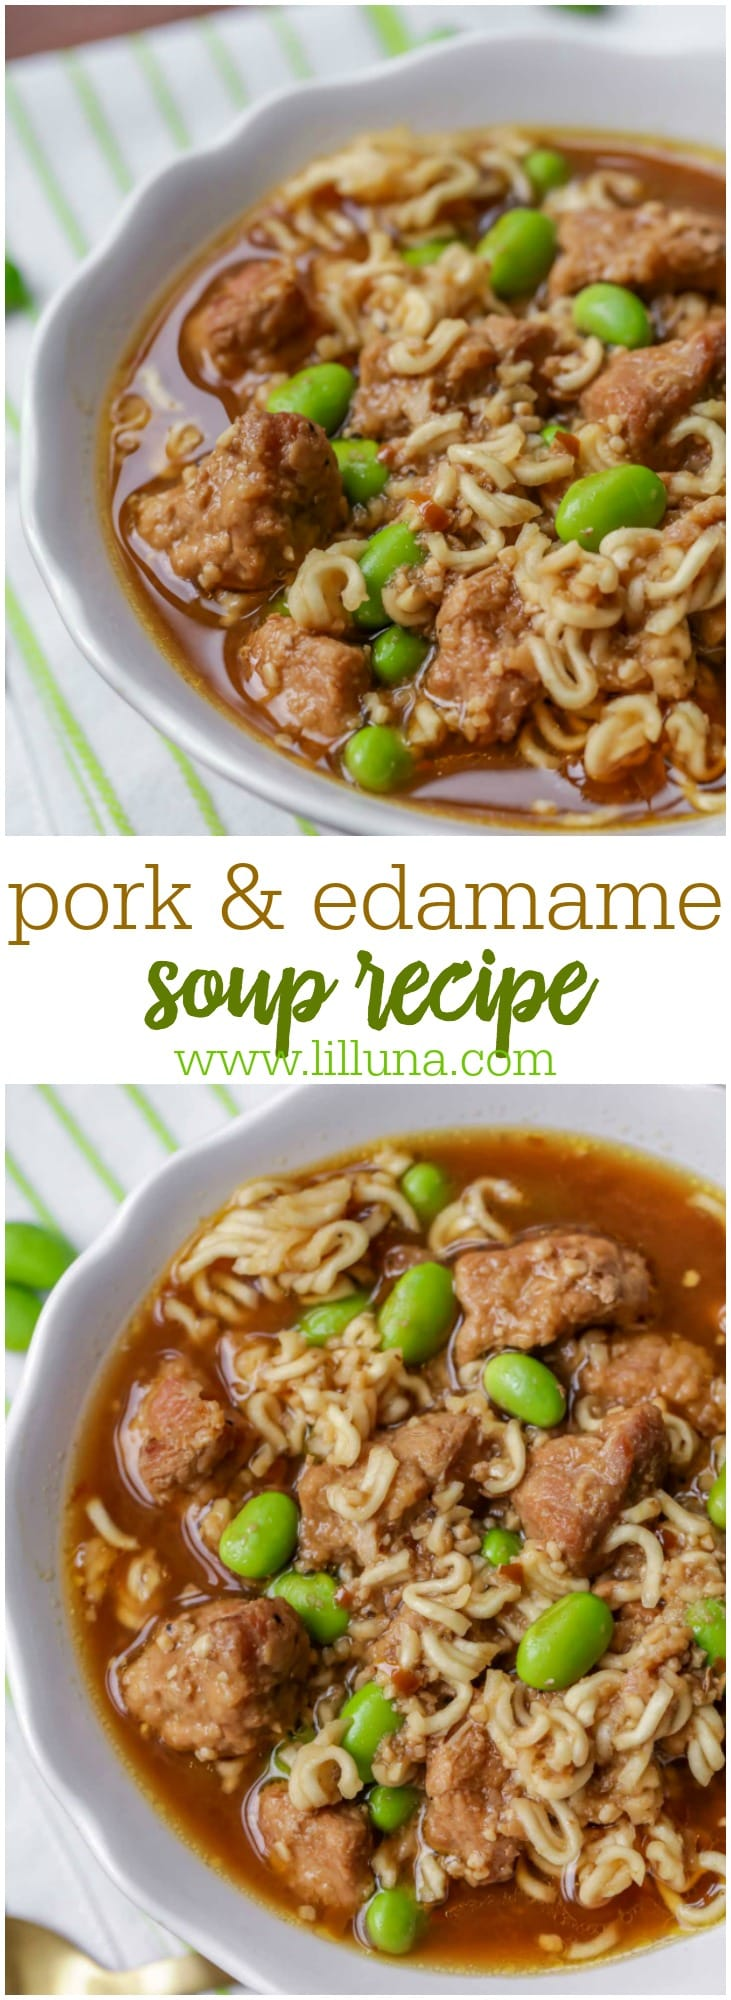 We love this Pork and Edamame Soup recipe Ingredients include pork, ramen noodles, edamame, & lots of seasonings!